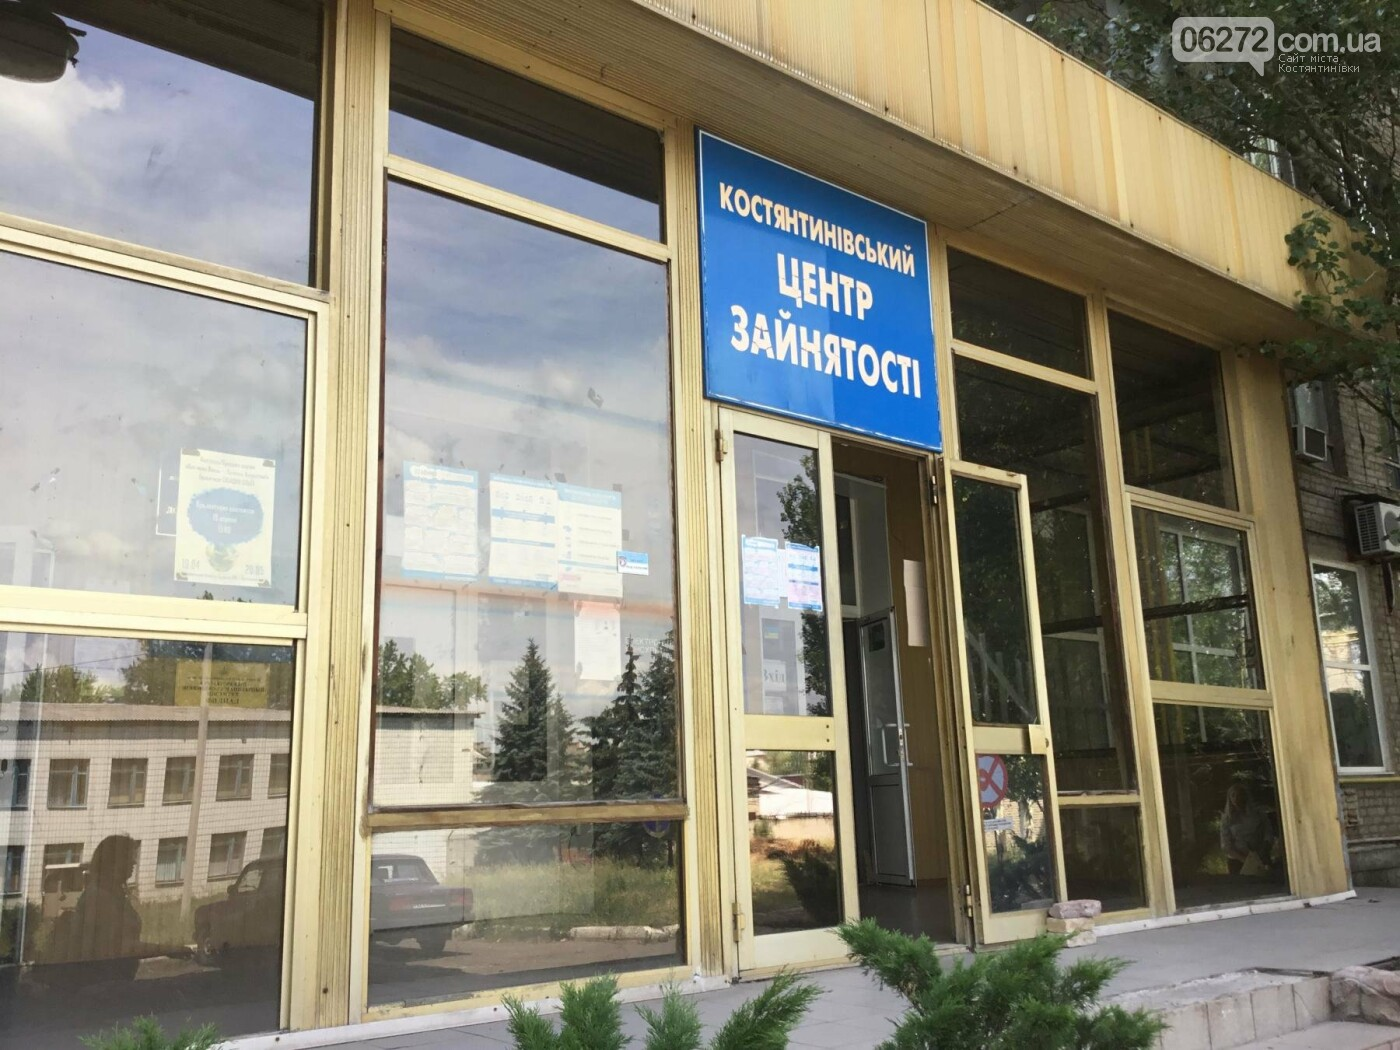 Константиновский центр занятости помогает в трудоустройстве бойцам АТО, фото-3